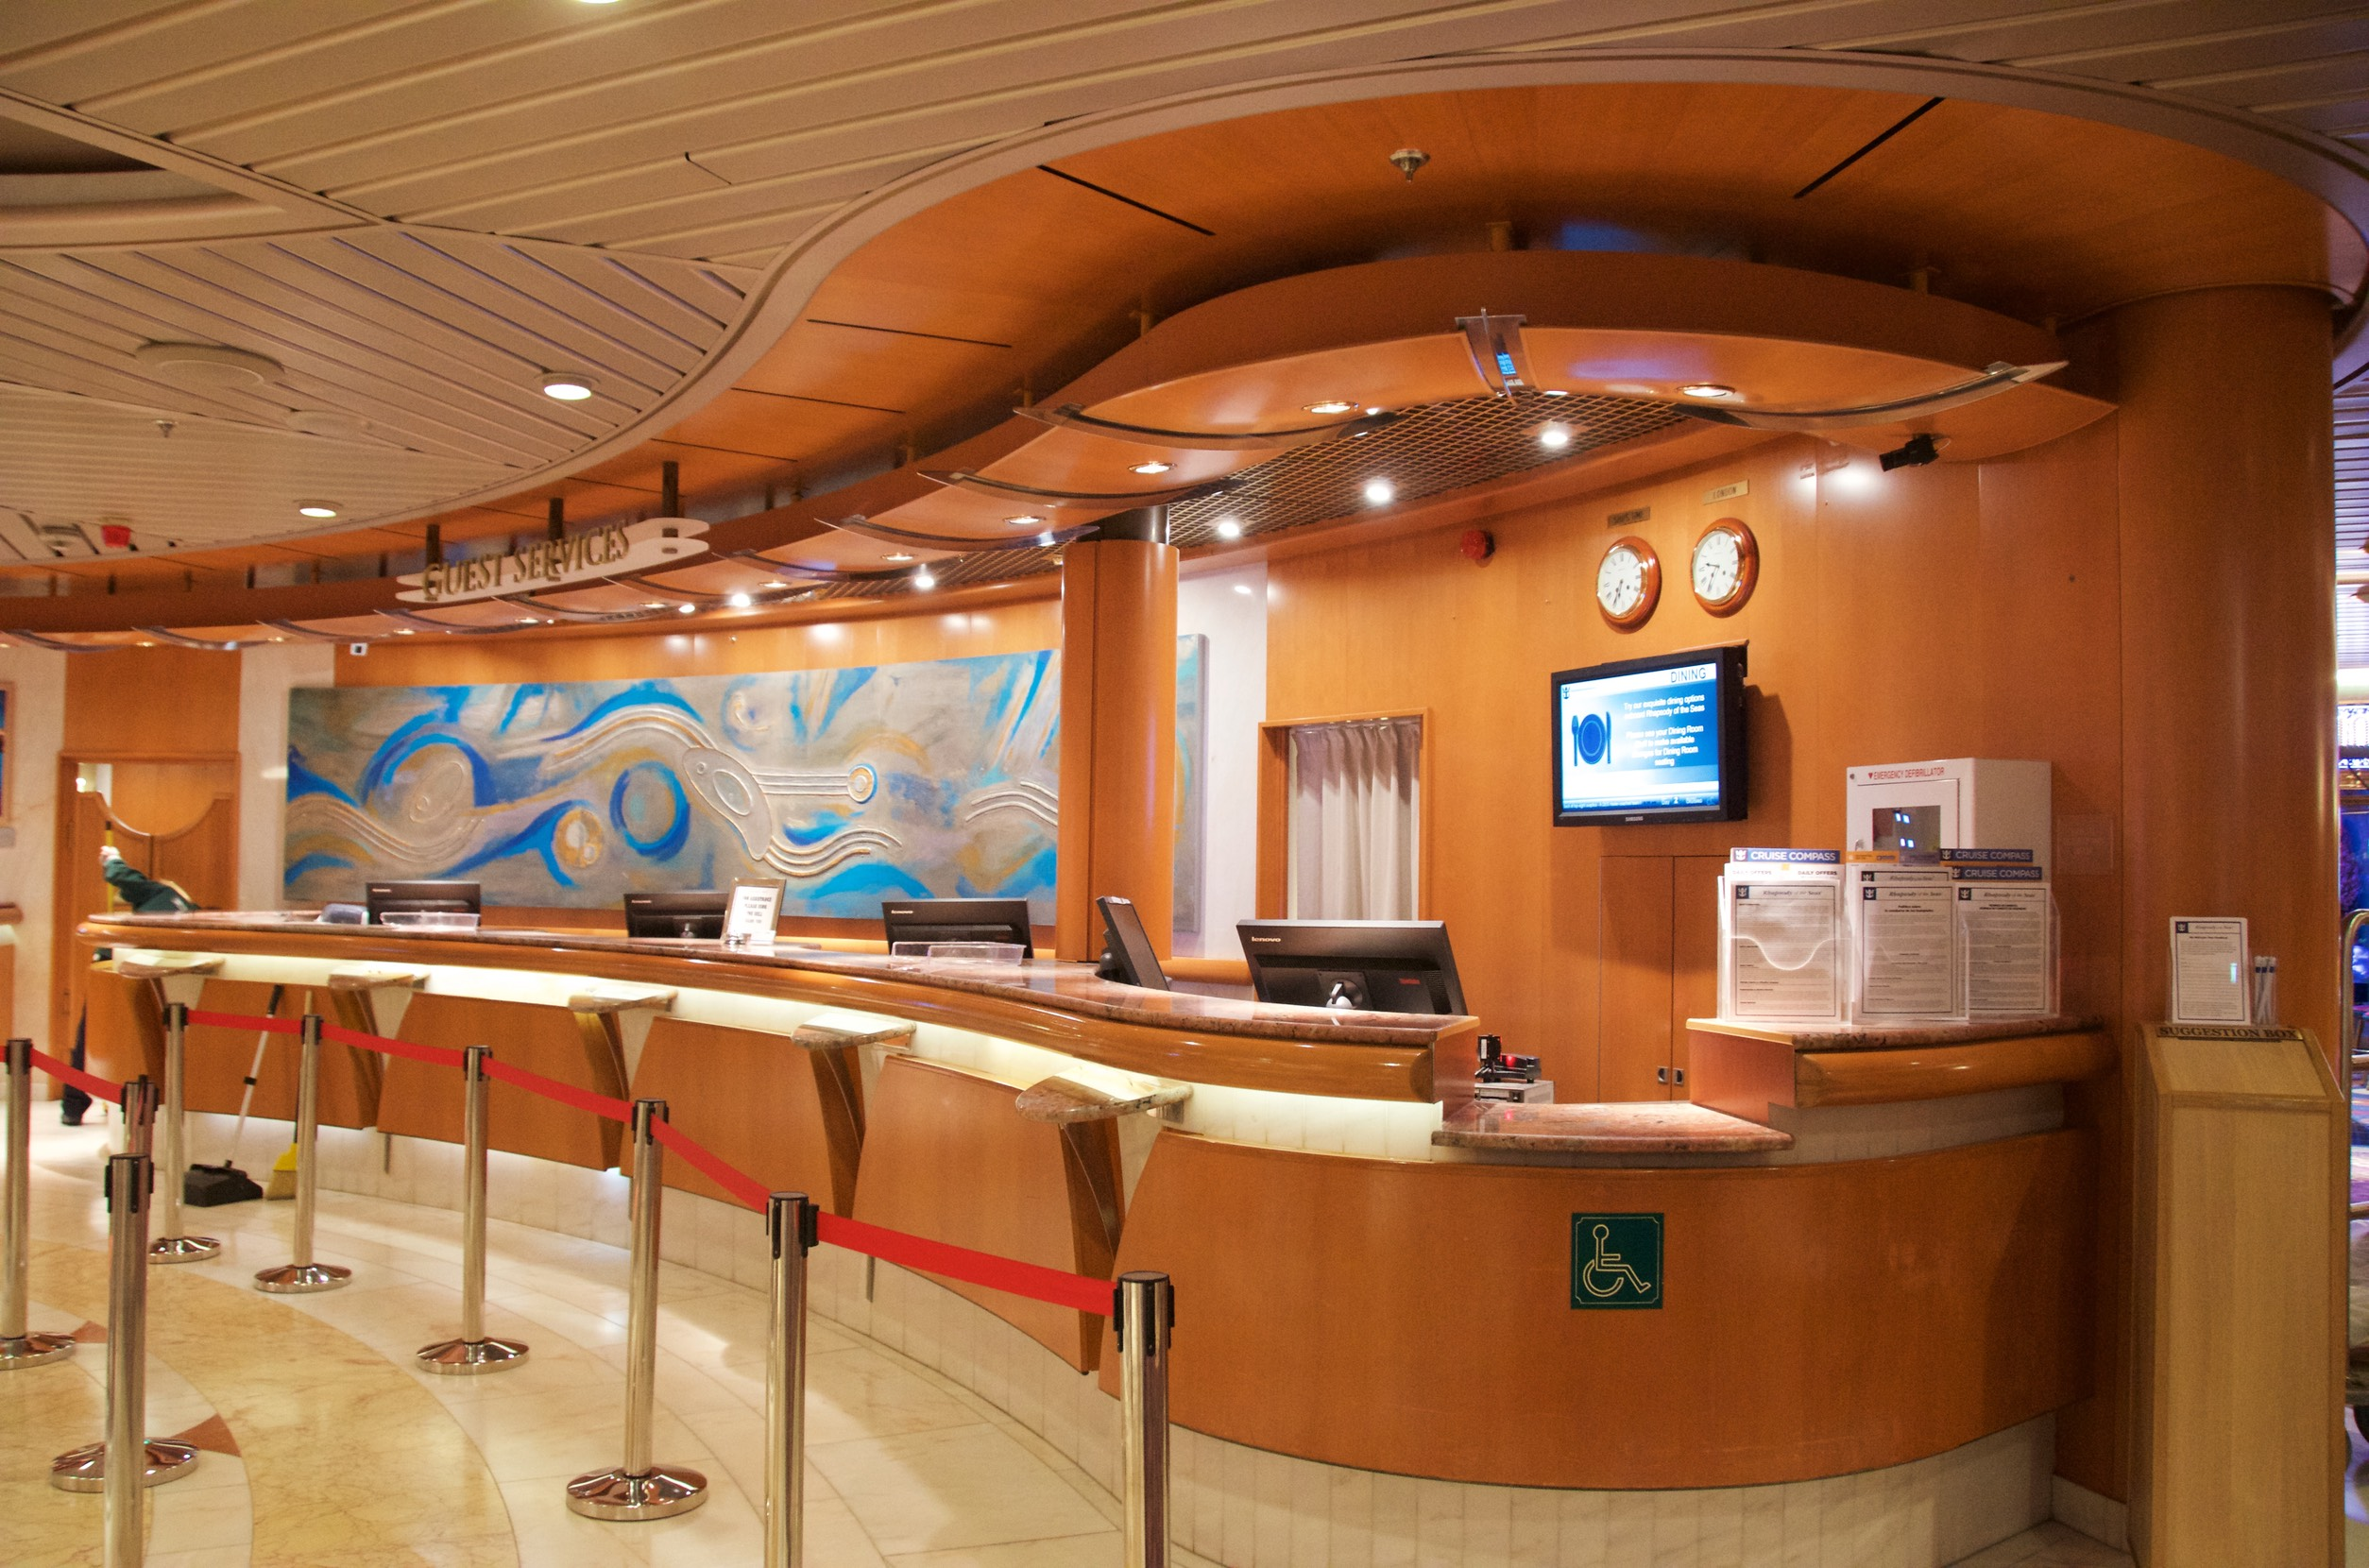 Shore excursions desk for Affitti cabina sole valle